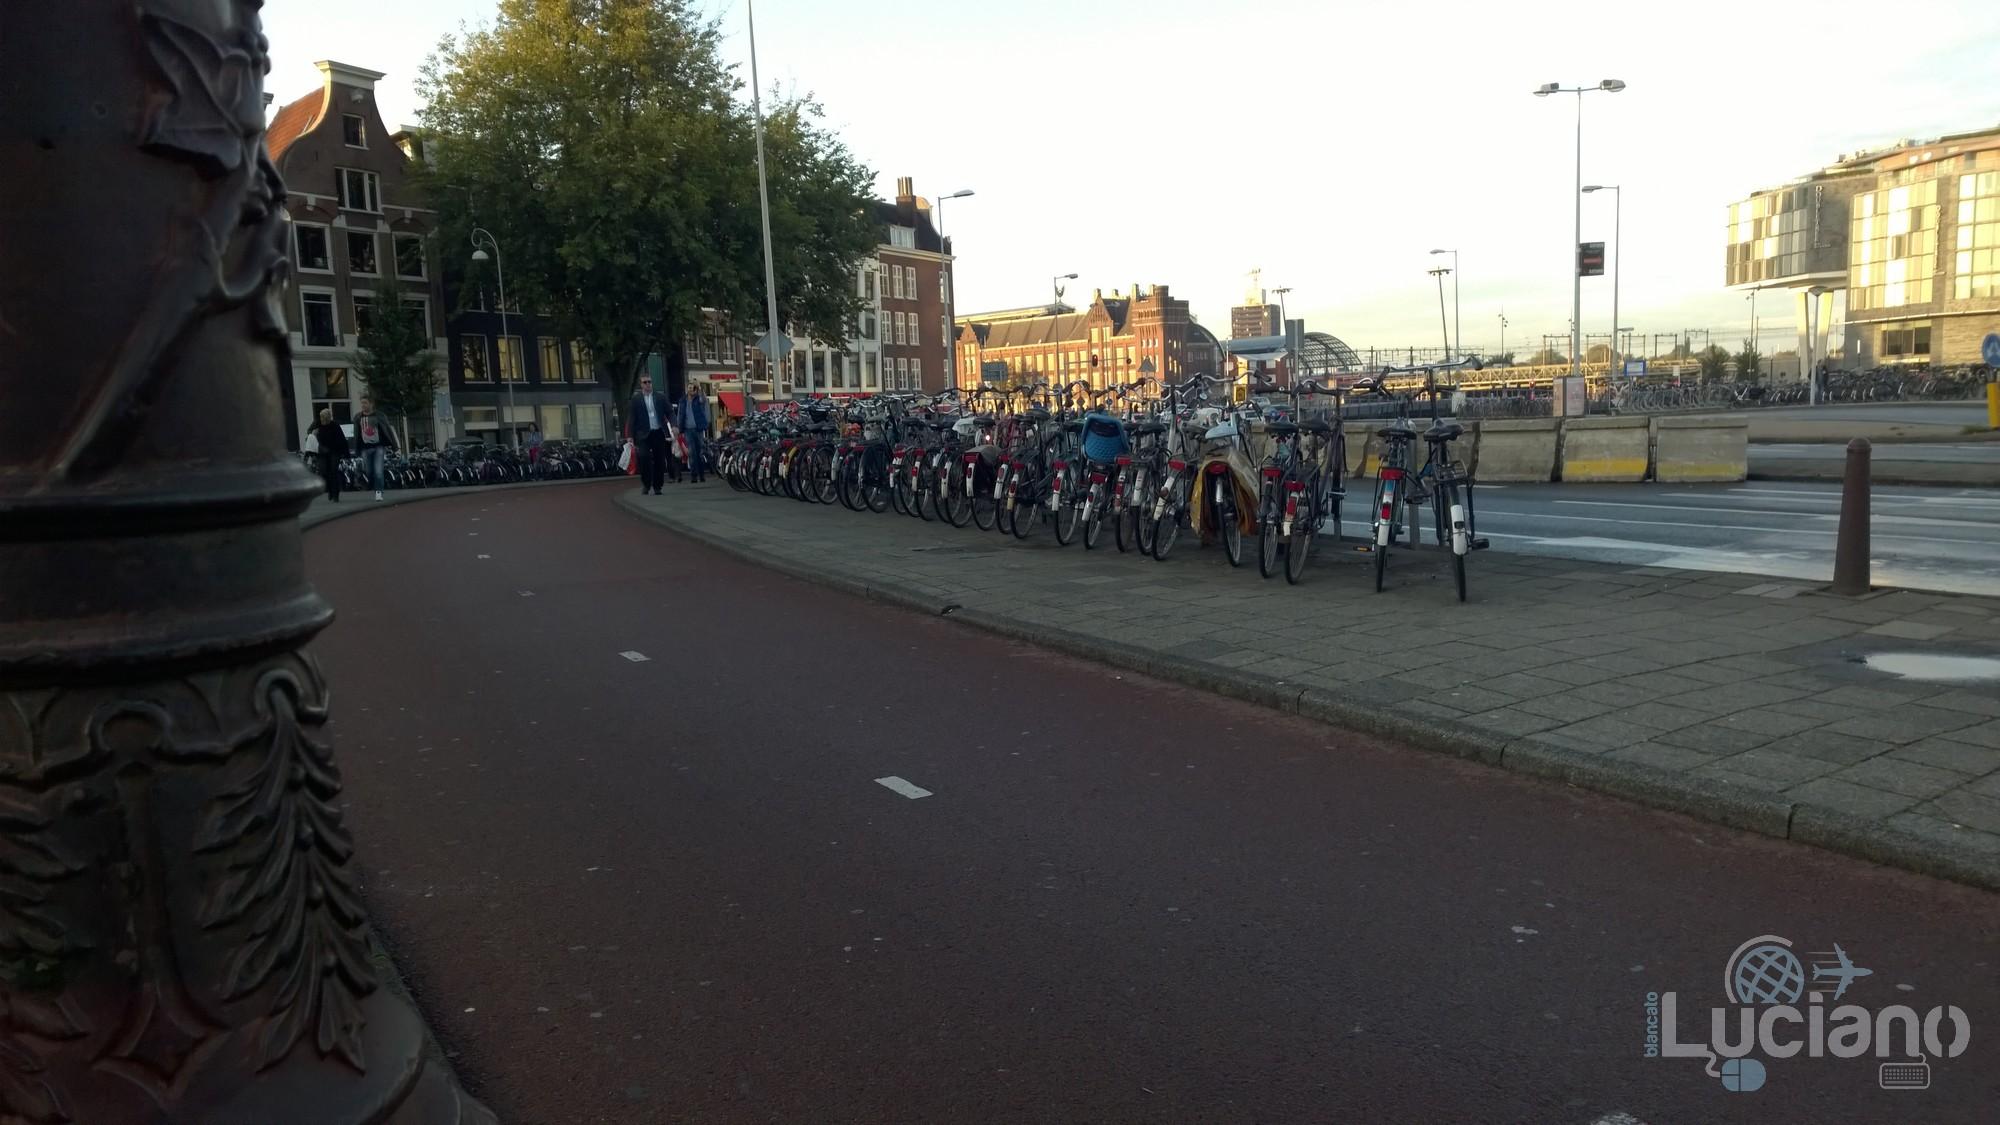 amsterdam-2014-vueling-lucianoblancatoit (215)